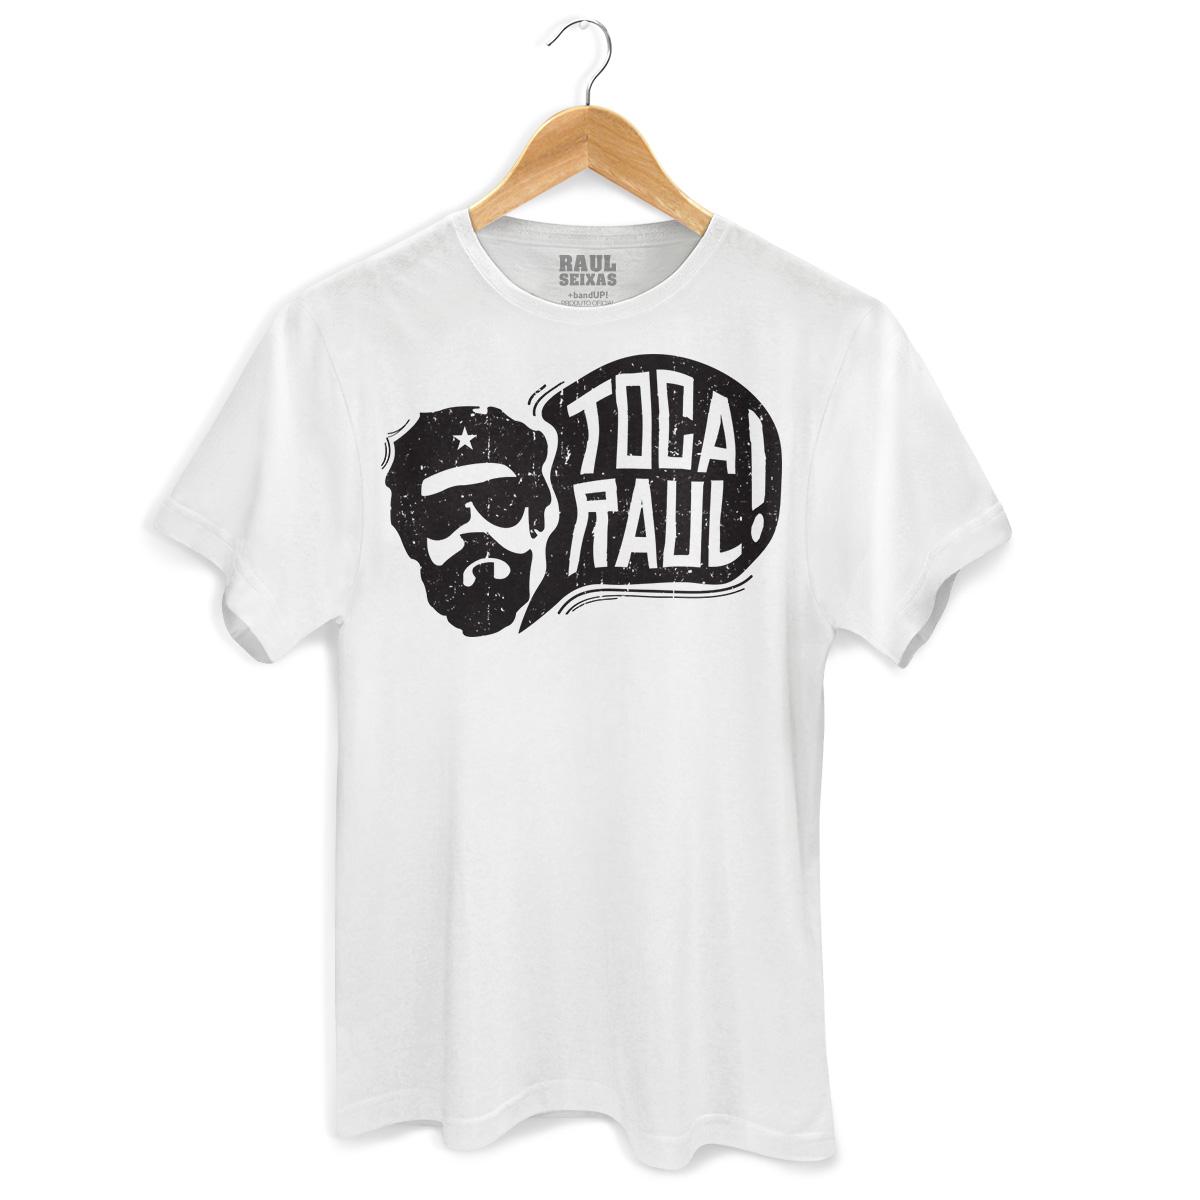 Camiseta Masculina Raul Seixas Toca Raul  - bandUP Store Marketplace